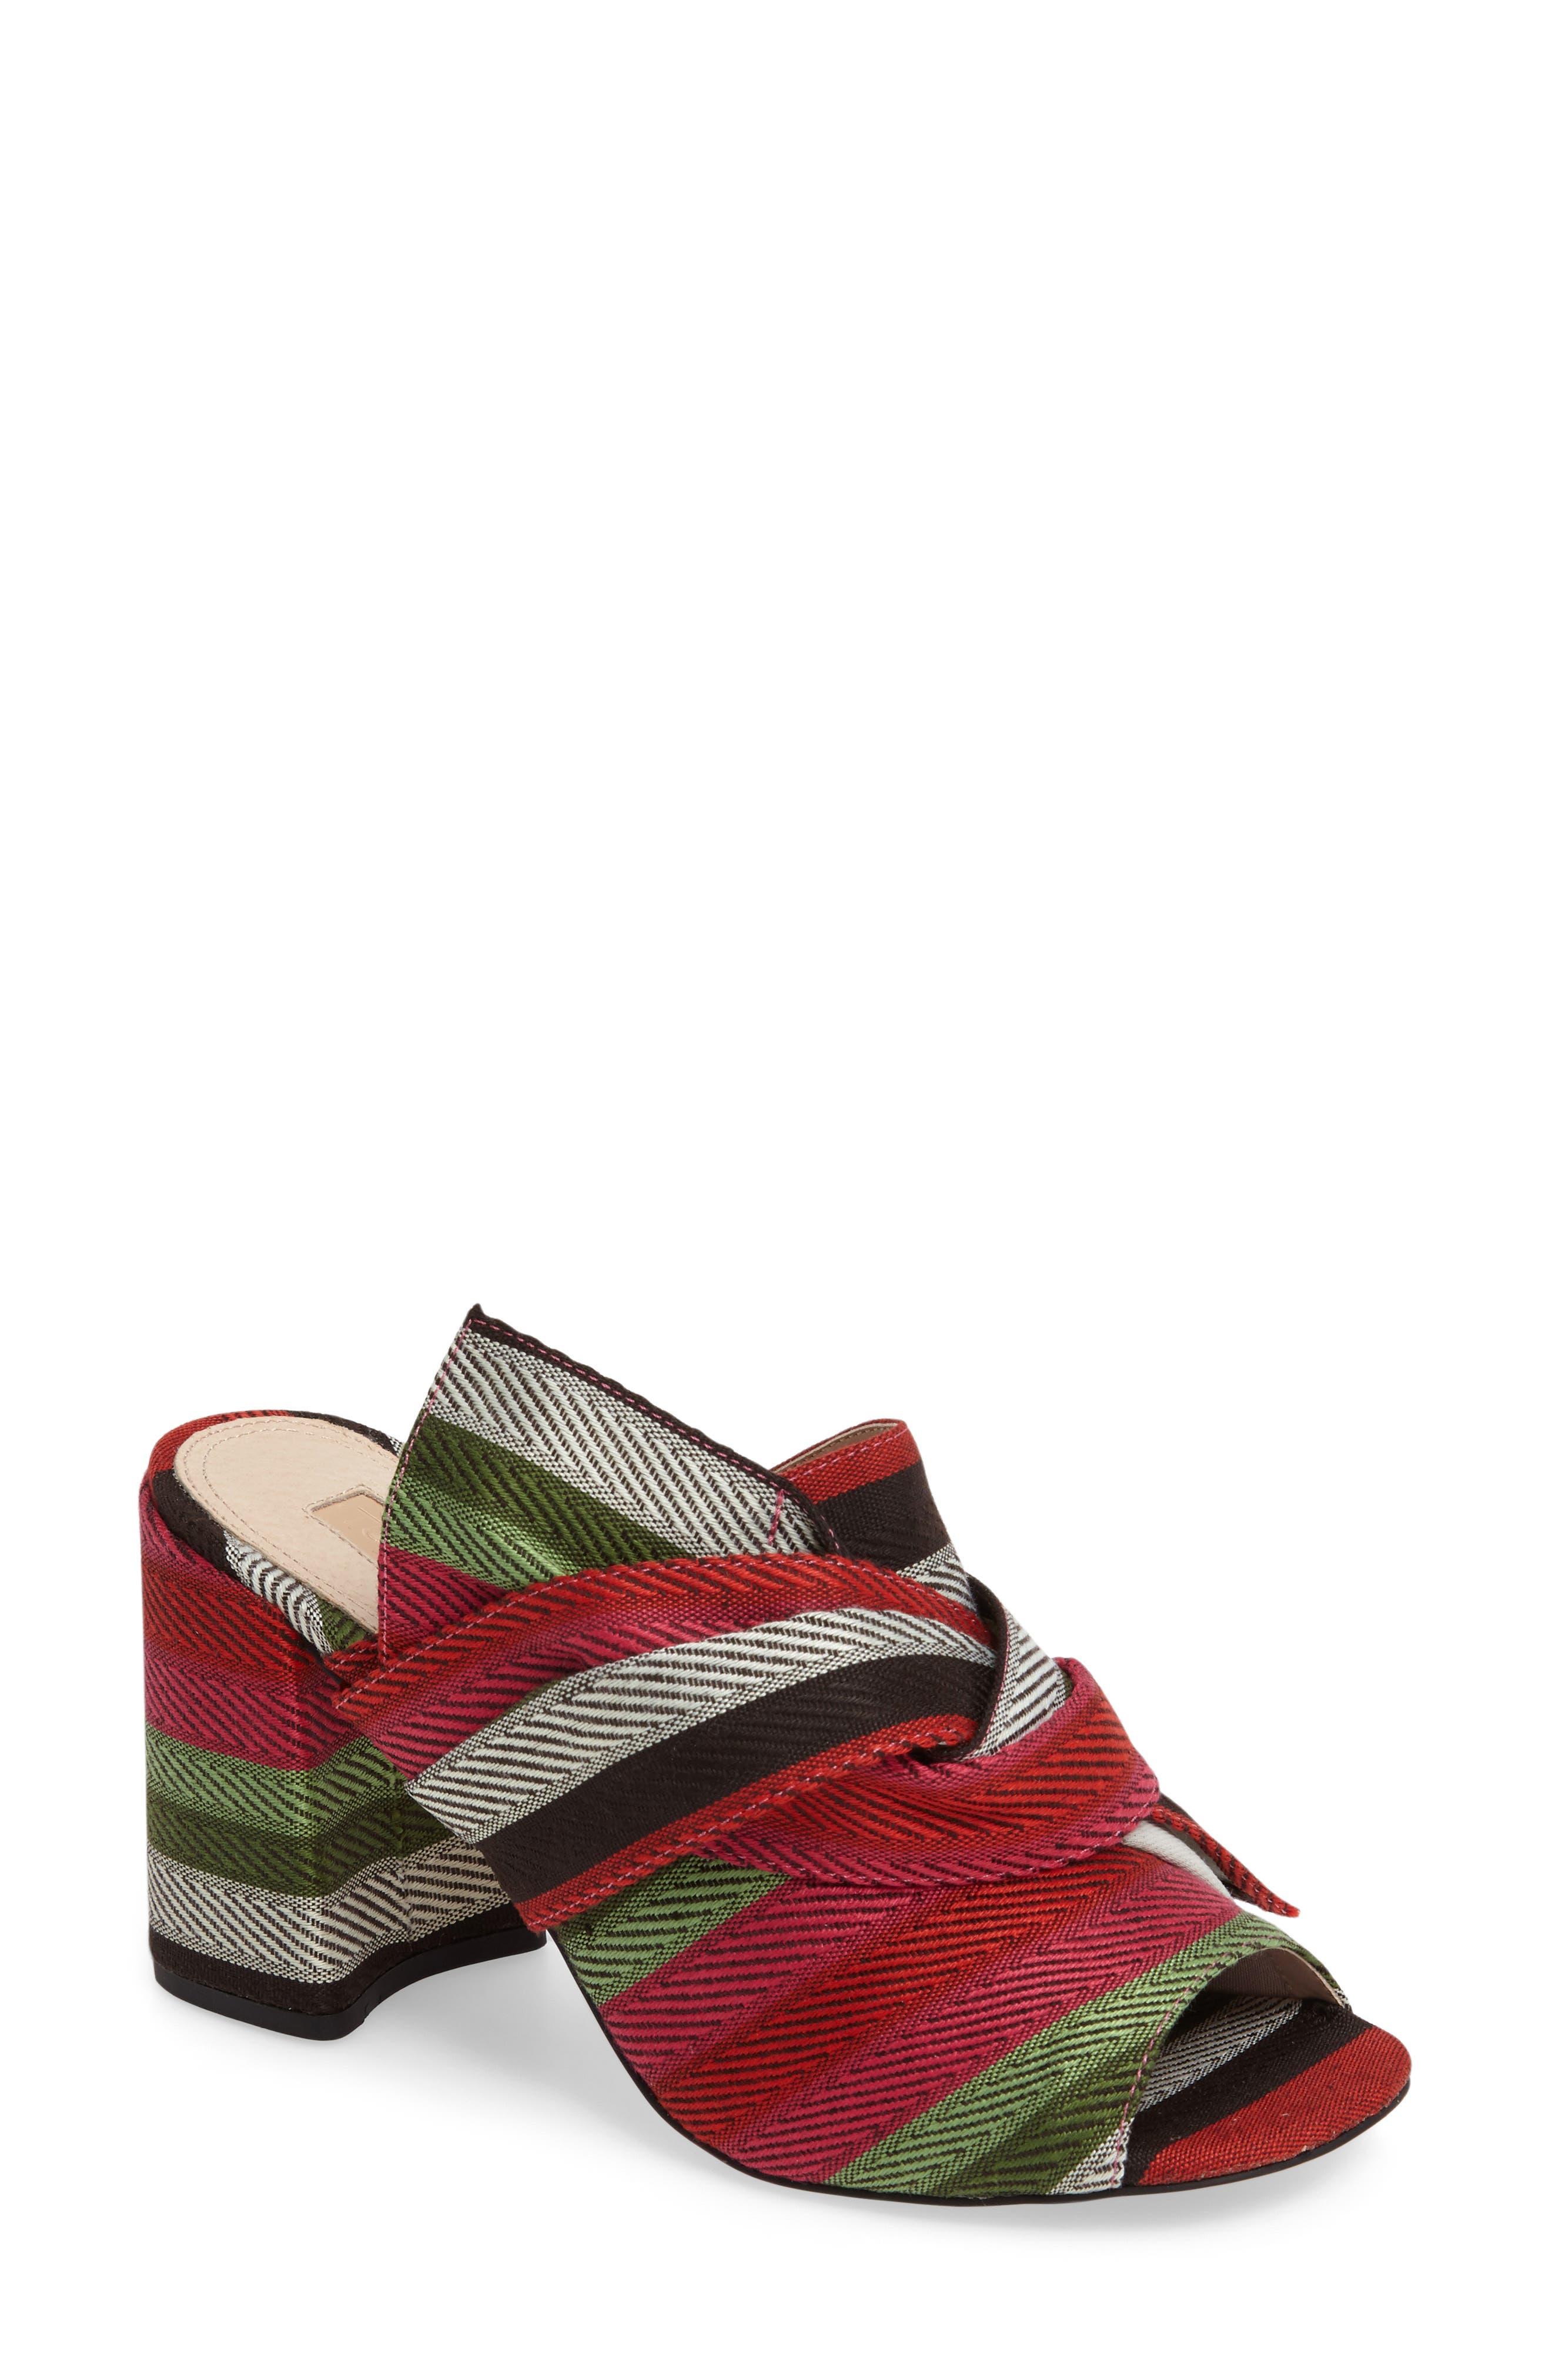 Rome Sandal,                         Main,                         color, 001